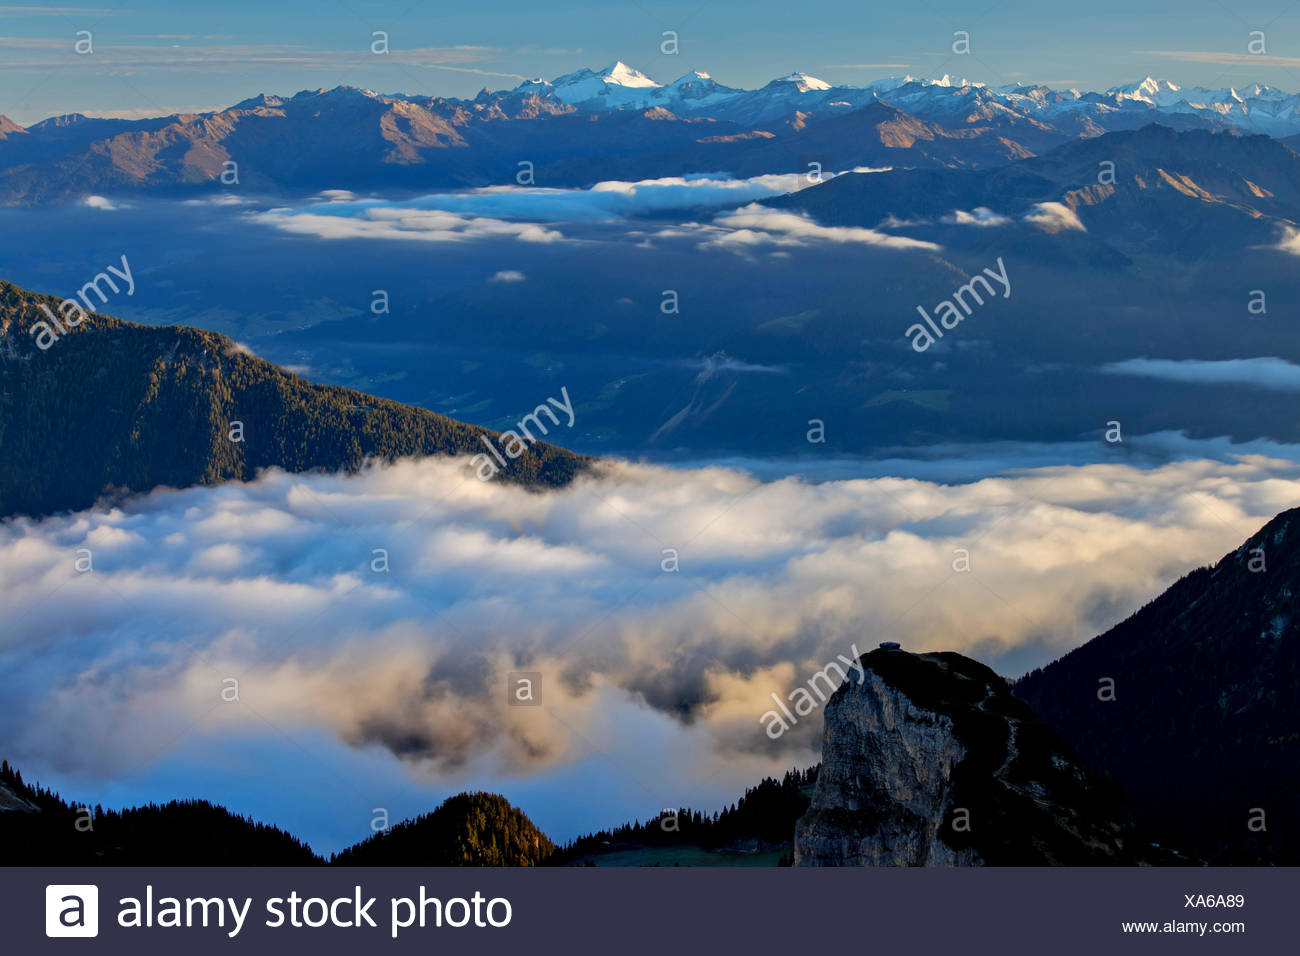 Austria, Tyrol, Rofan, Rofangebirge, Hochiss, Großer Möseler, Hochfeiler, Stock Photo